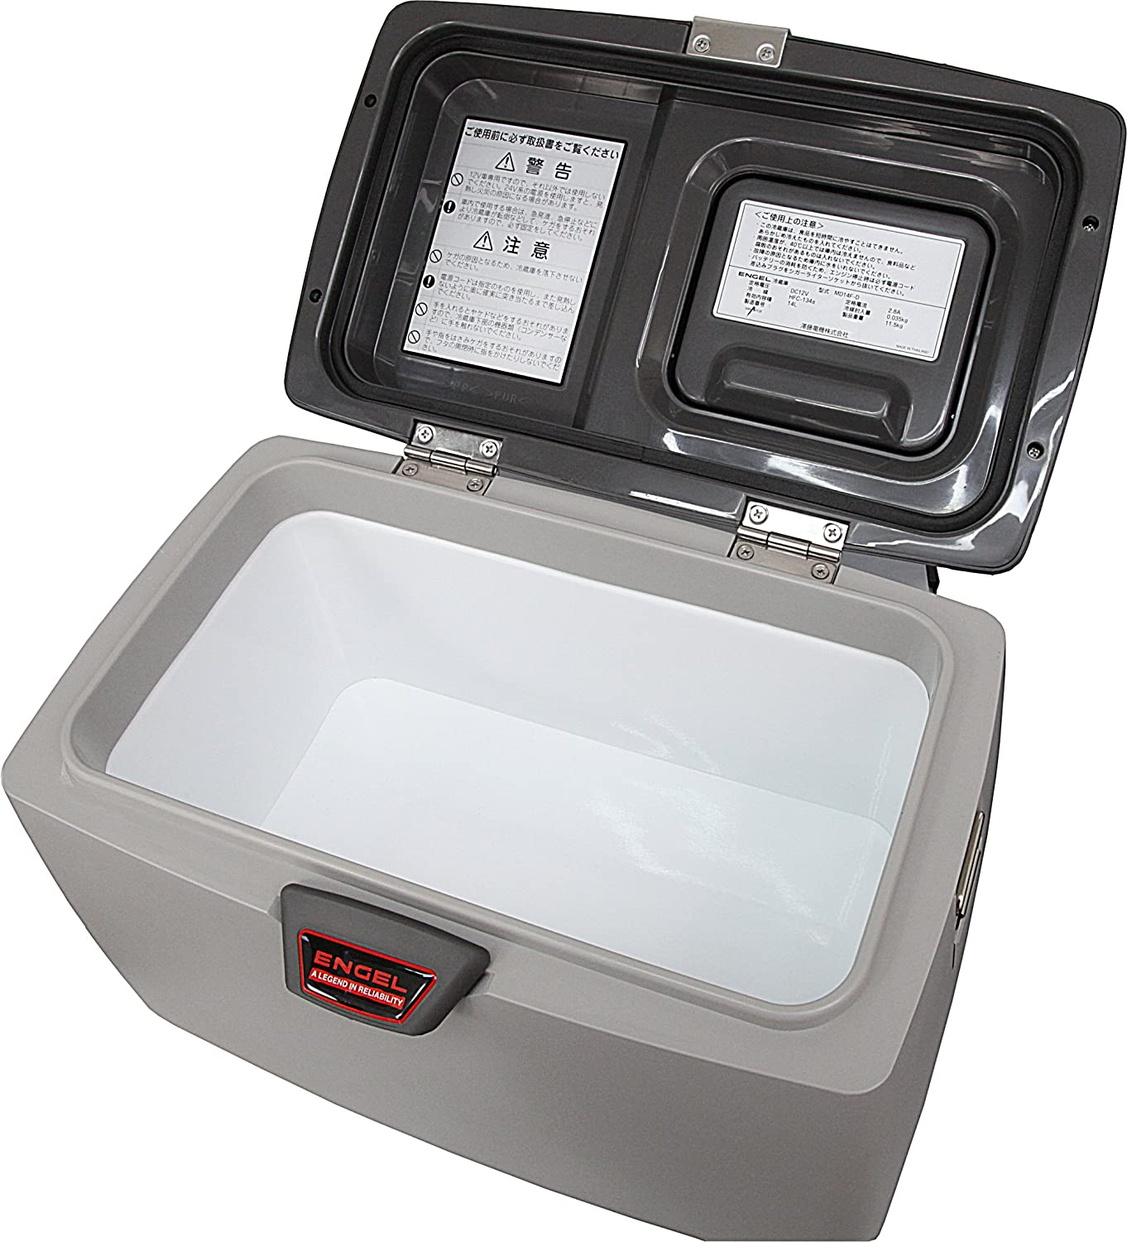 ENGEL(エンゲル) ポータブル冷凍冷蔵庫 MD14F MD14Fの商品画像5